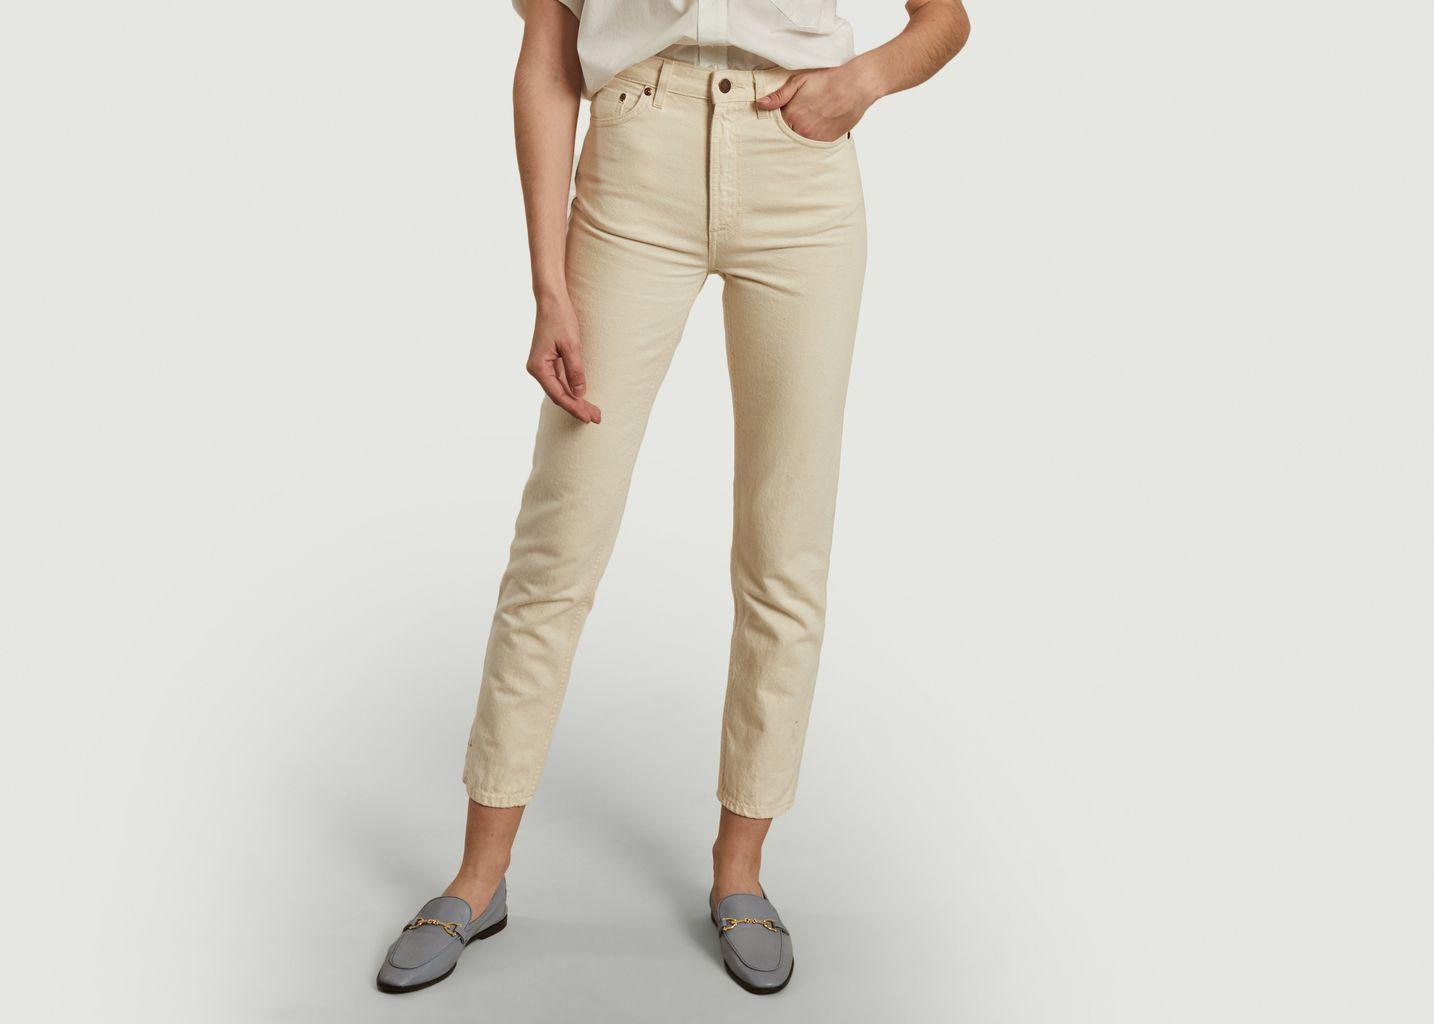 Jean Breezy Britt - Nudie Jeans